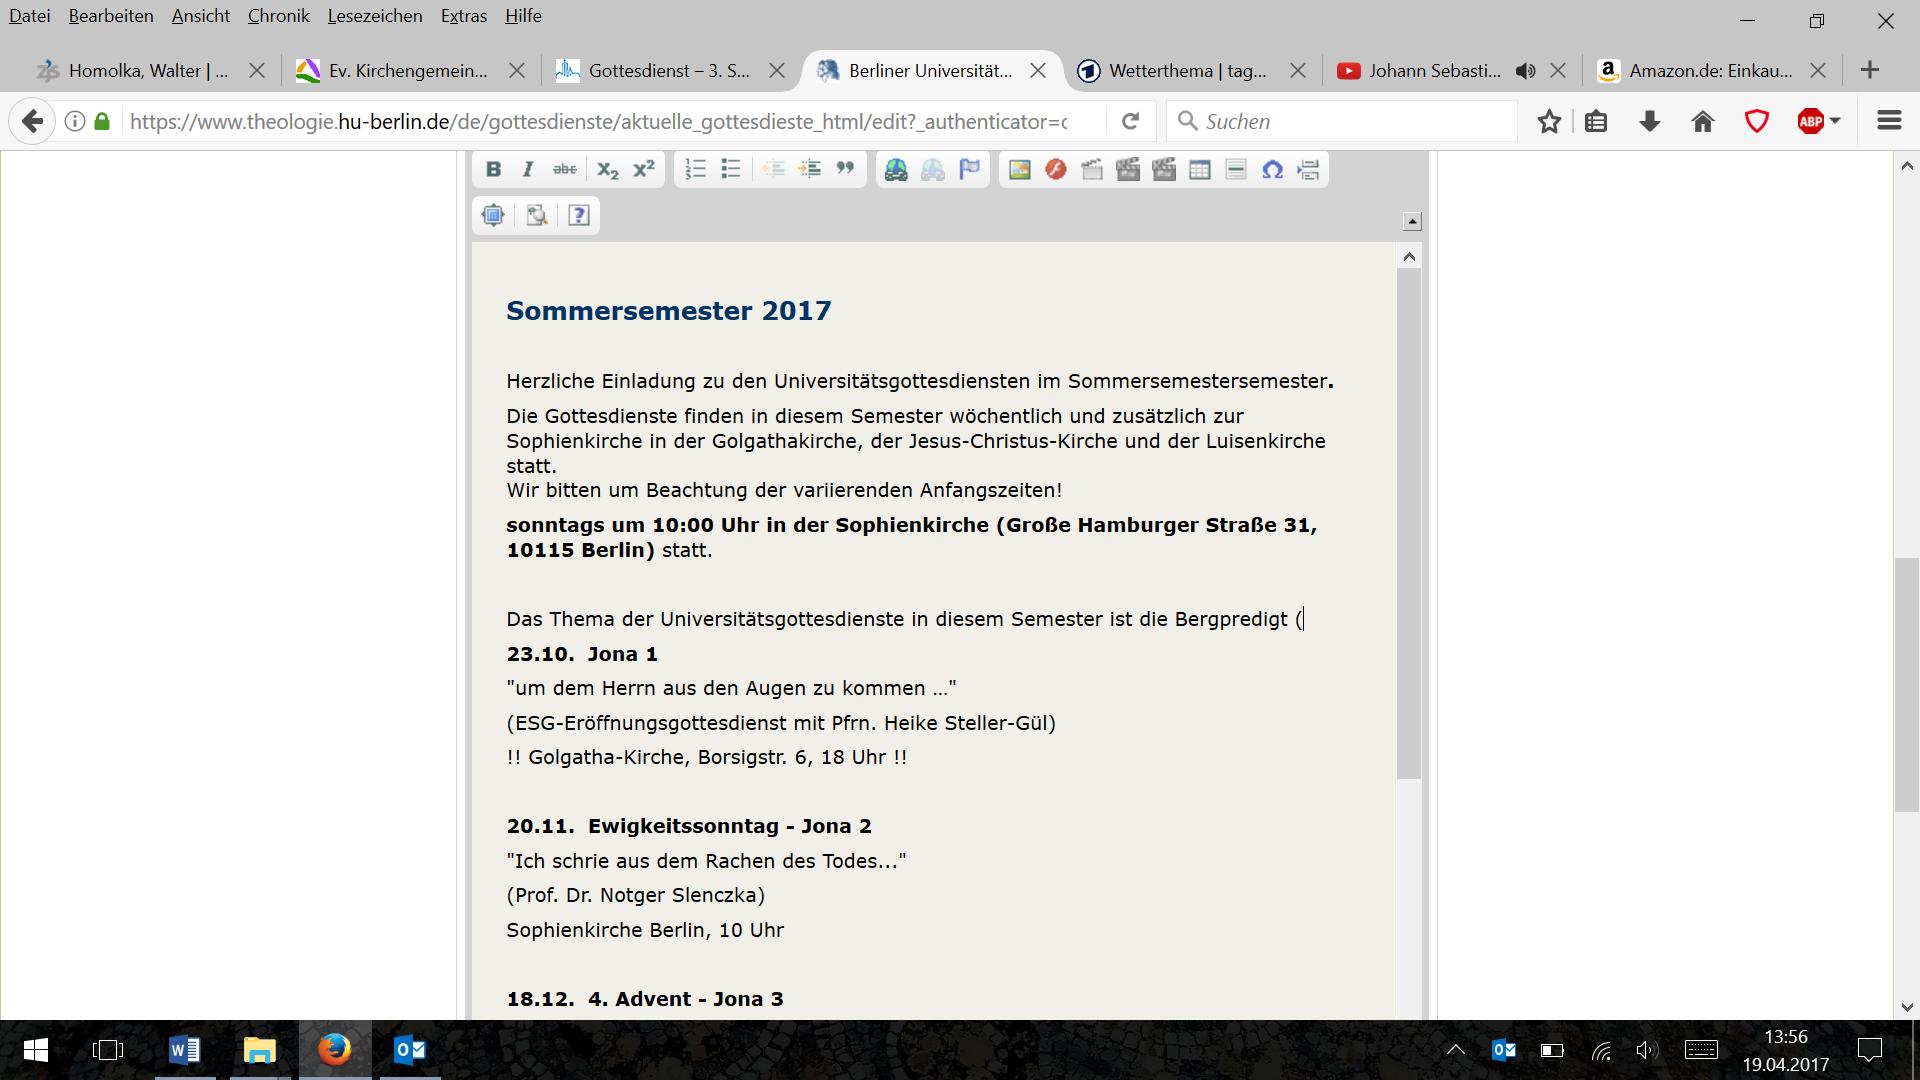 aktuelle_gottesdieste_html.text.image0